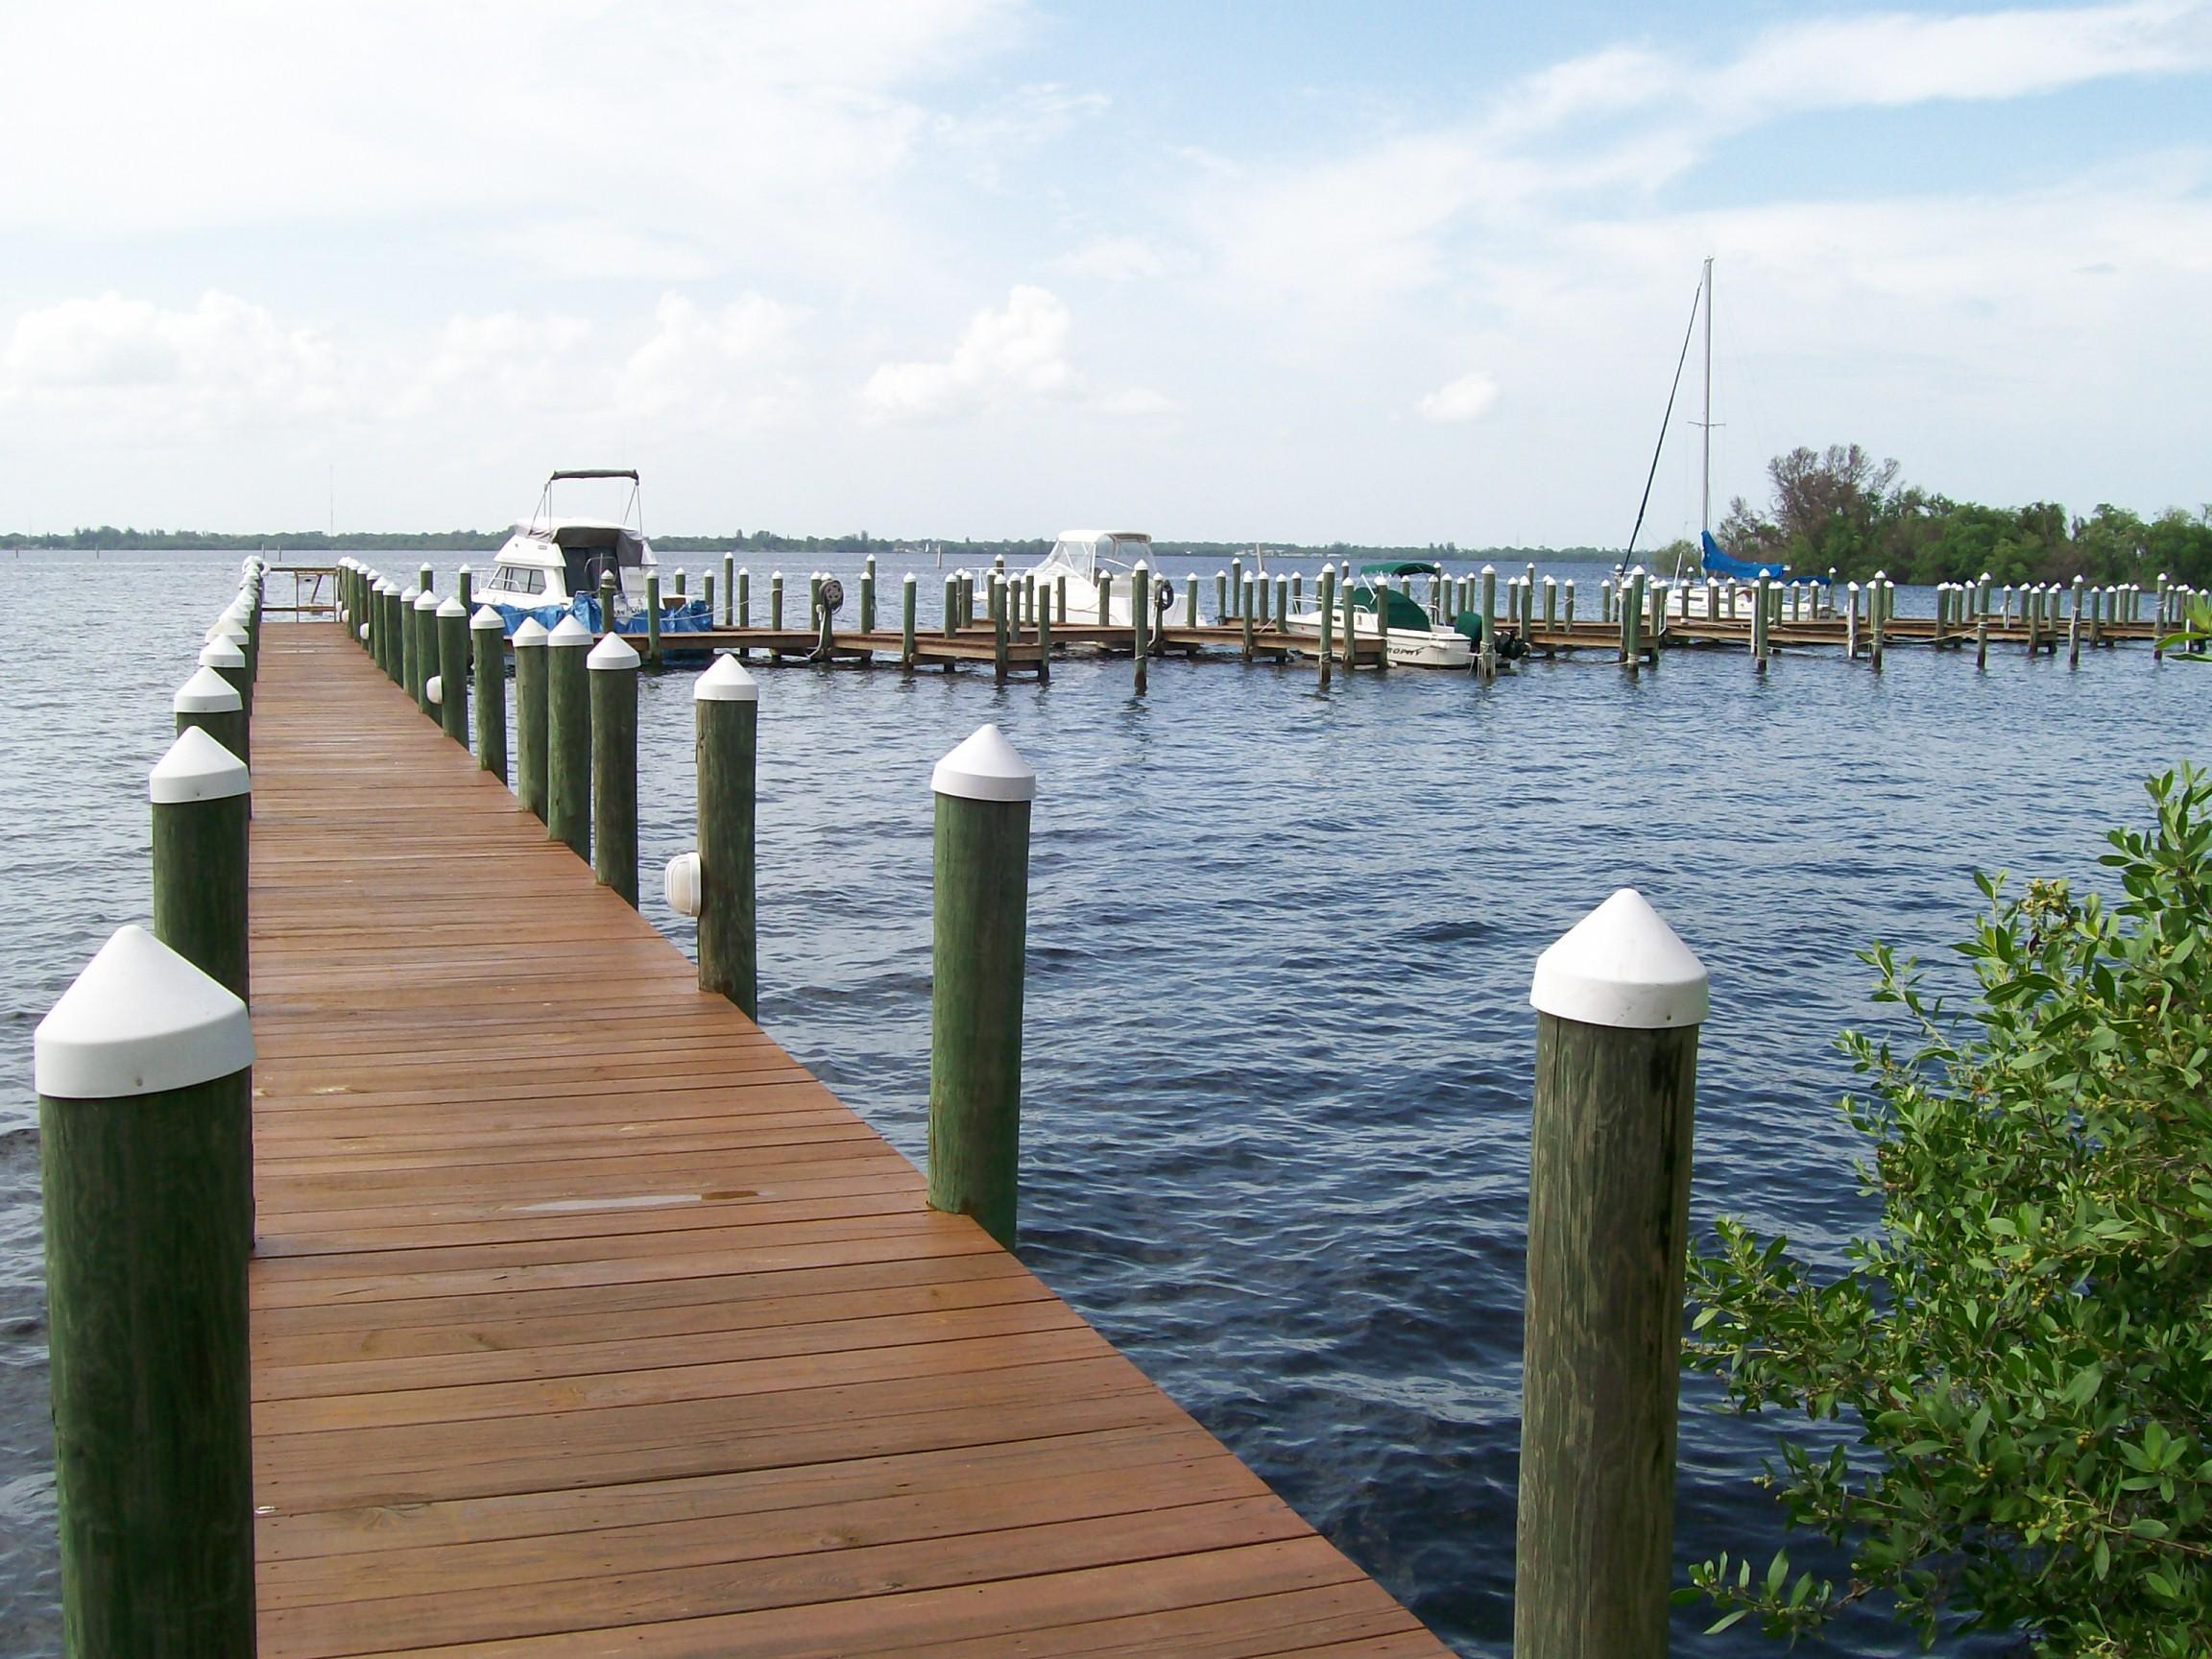 2010-08-11 docks 008